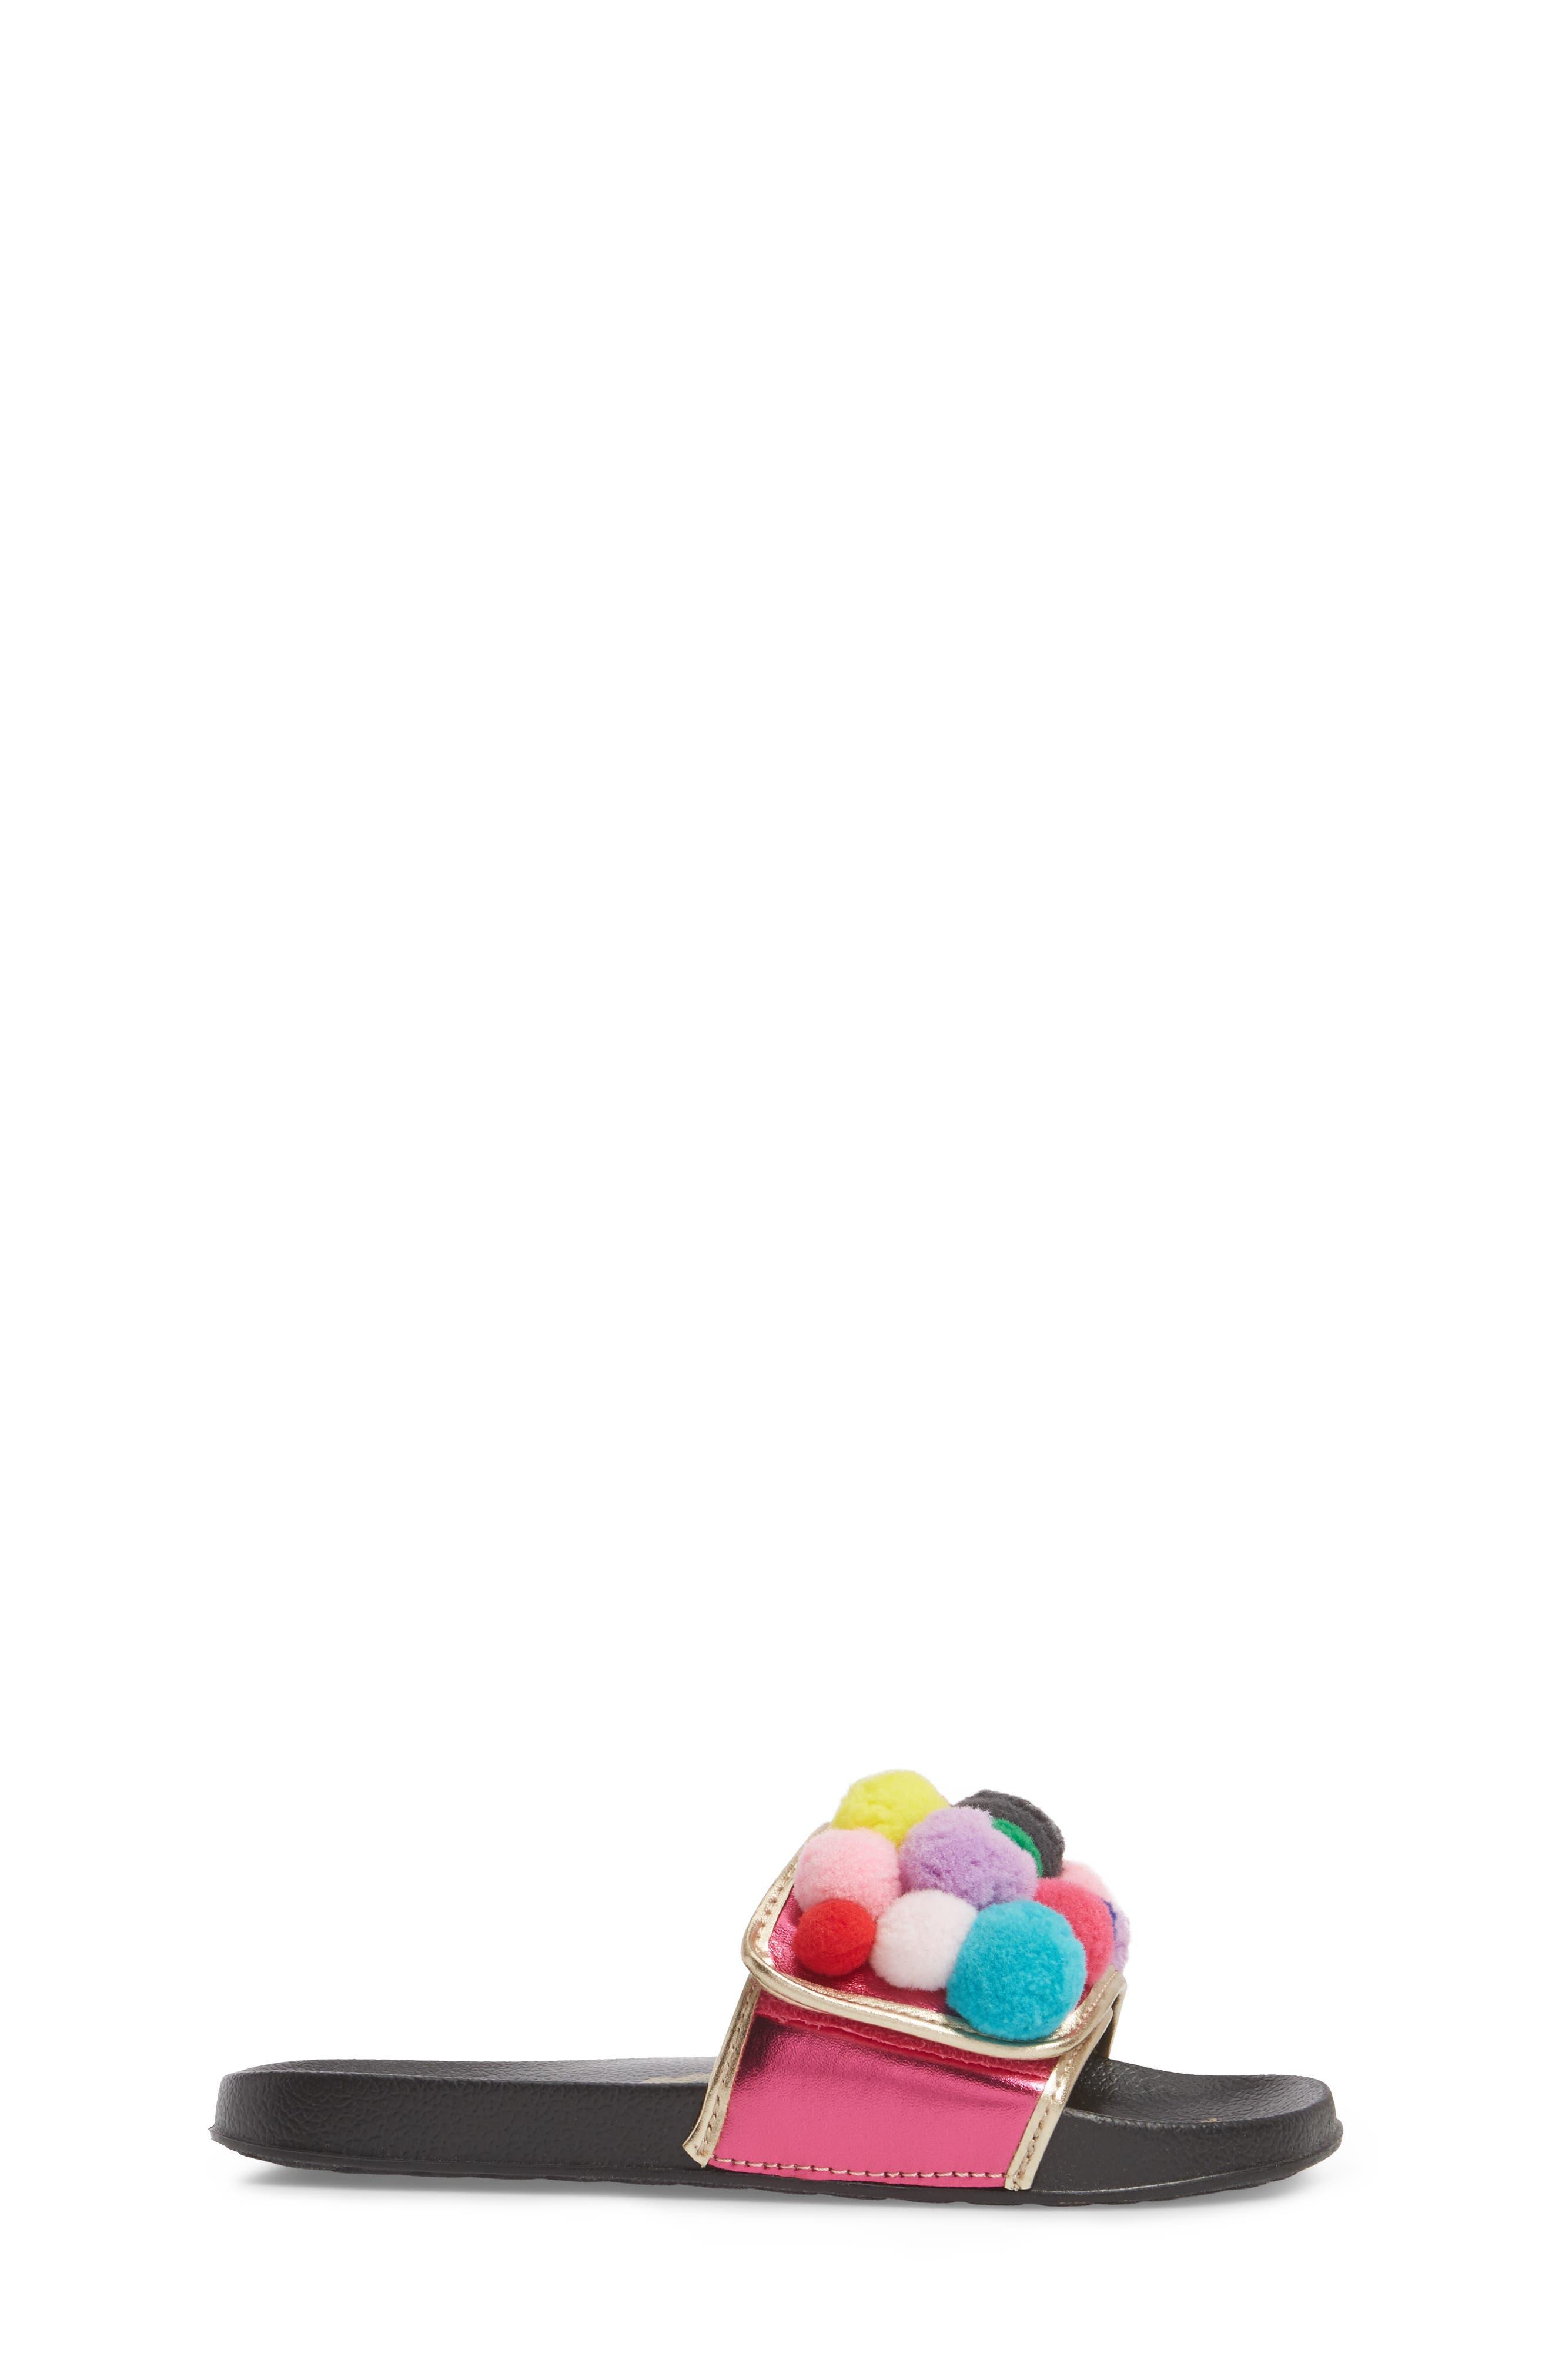 Faux Fur Mackie Cayman Sandal,                             Alternate thumbnail 3, color,                             697